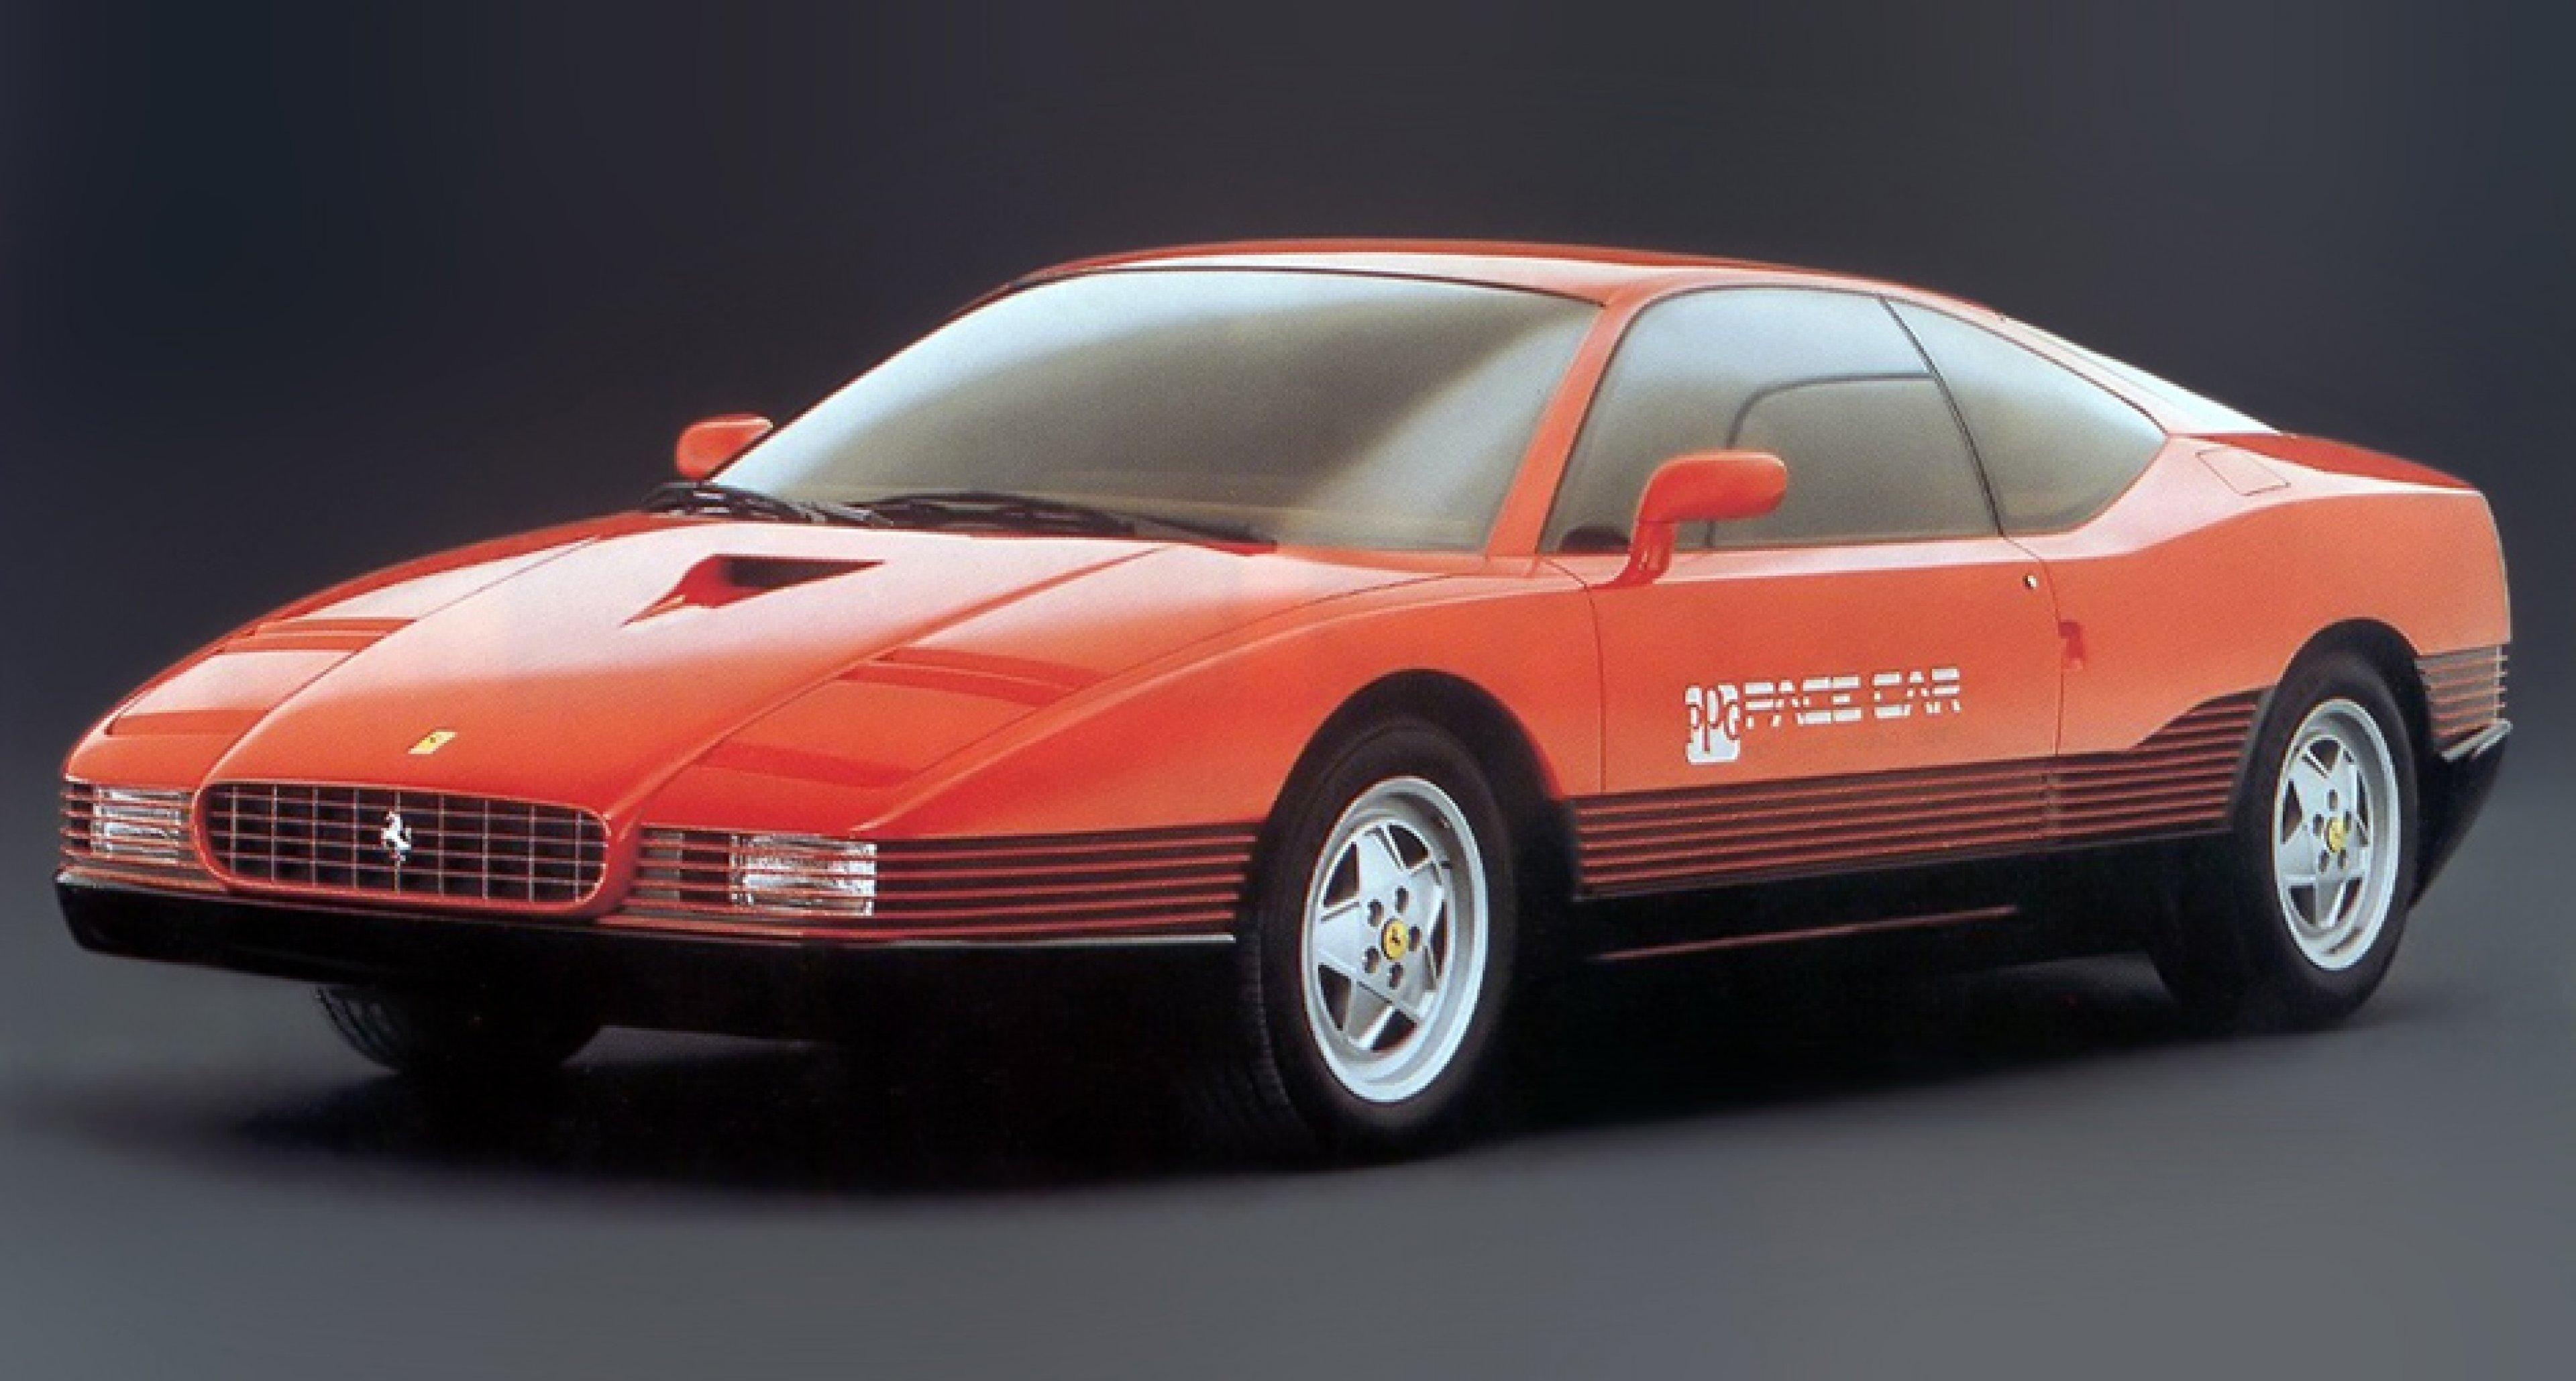 Ferrari Mondial T PPG Pace Car